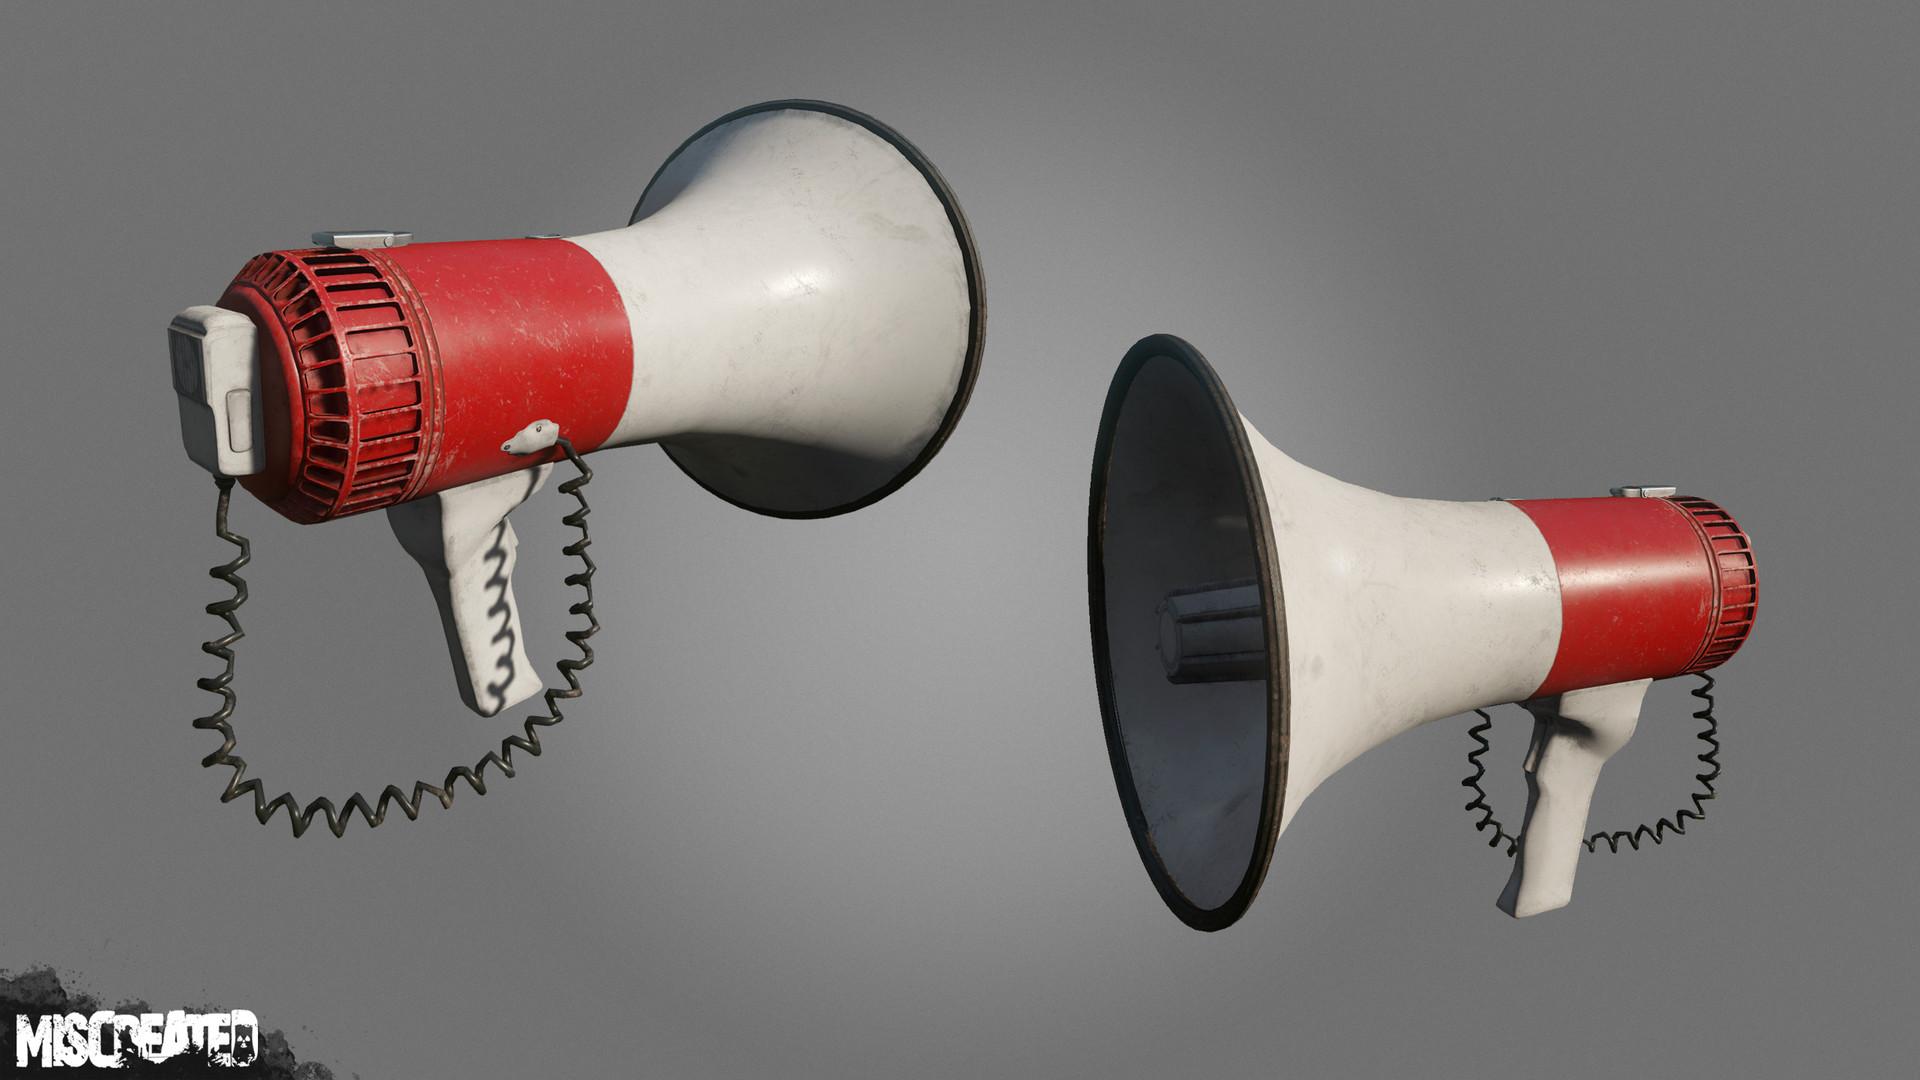 Carl kent megaphone